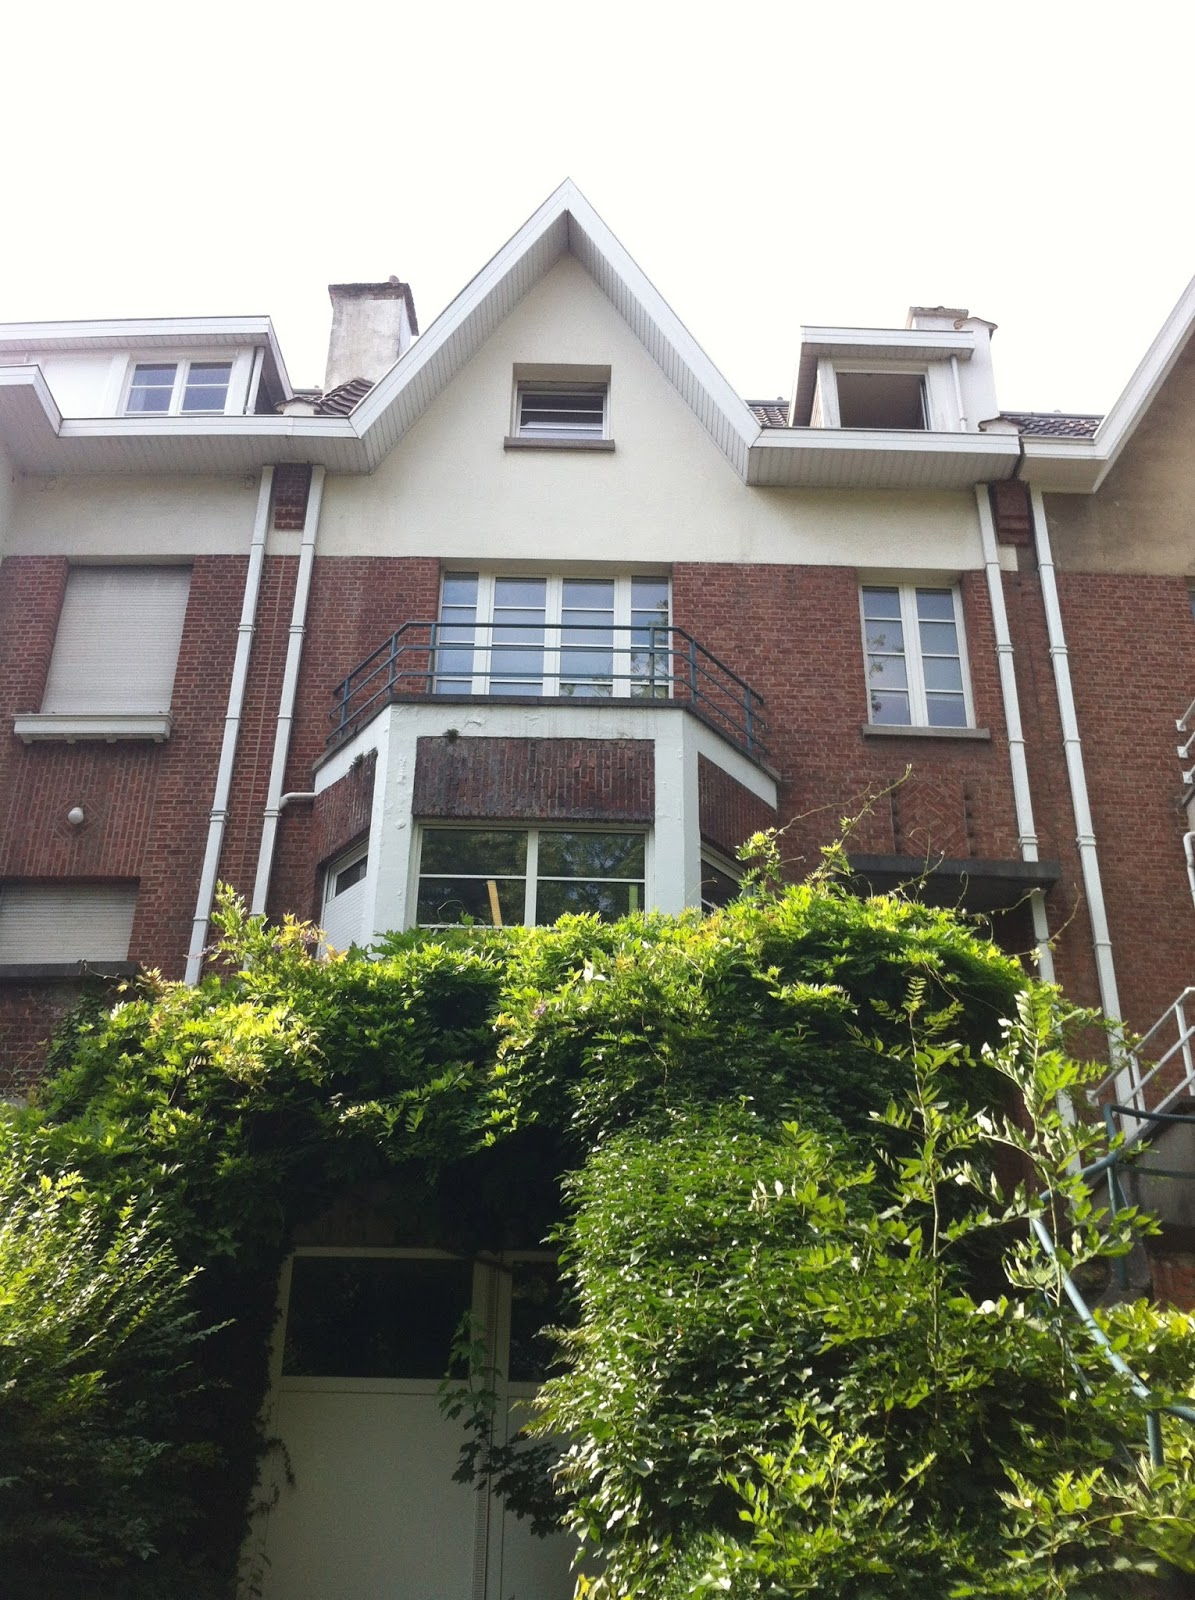 Afbeeldingsresultaat voor Watermael-Boitsfort, Avenue Delleur 17 herge